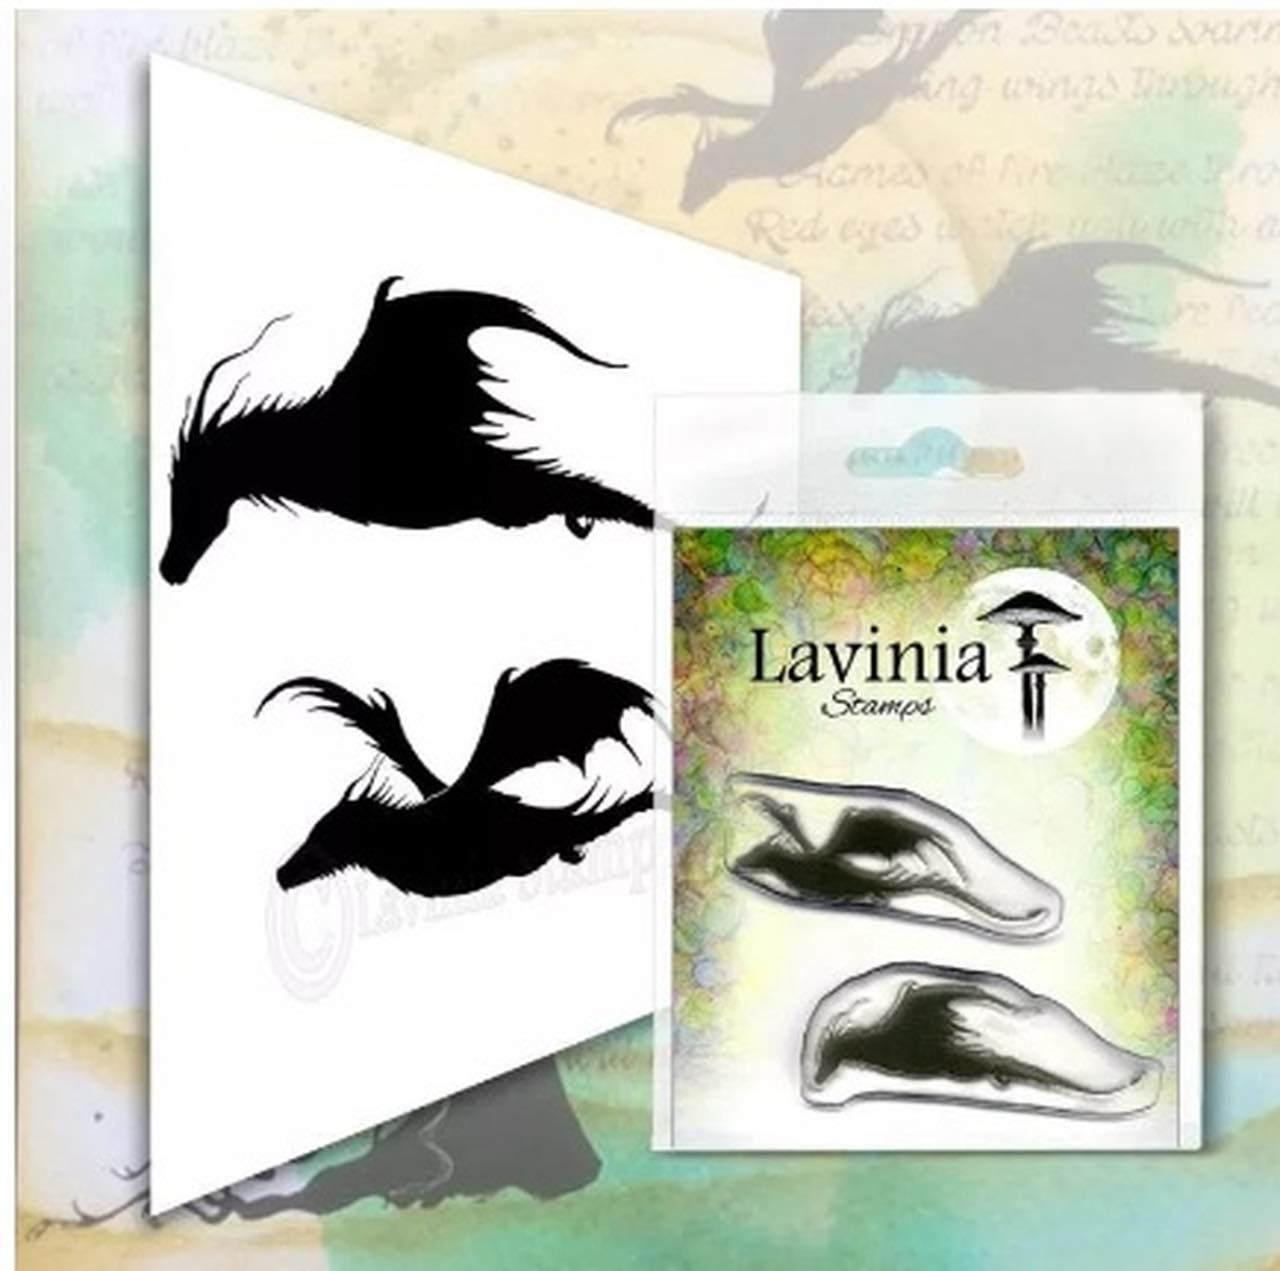 Lavinia Stamps - Dragon Stamp Set